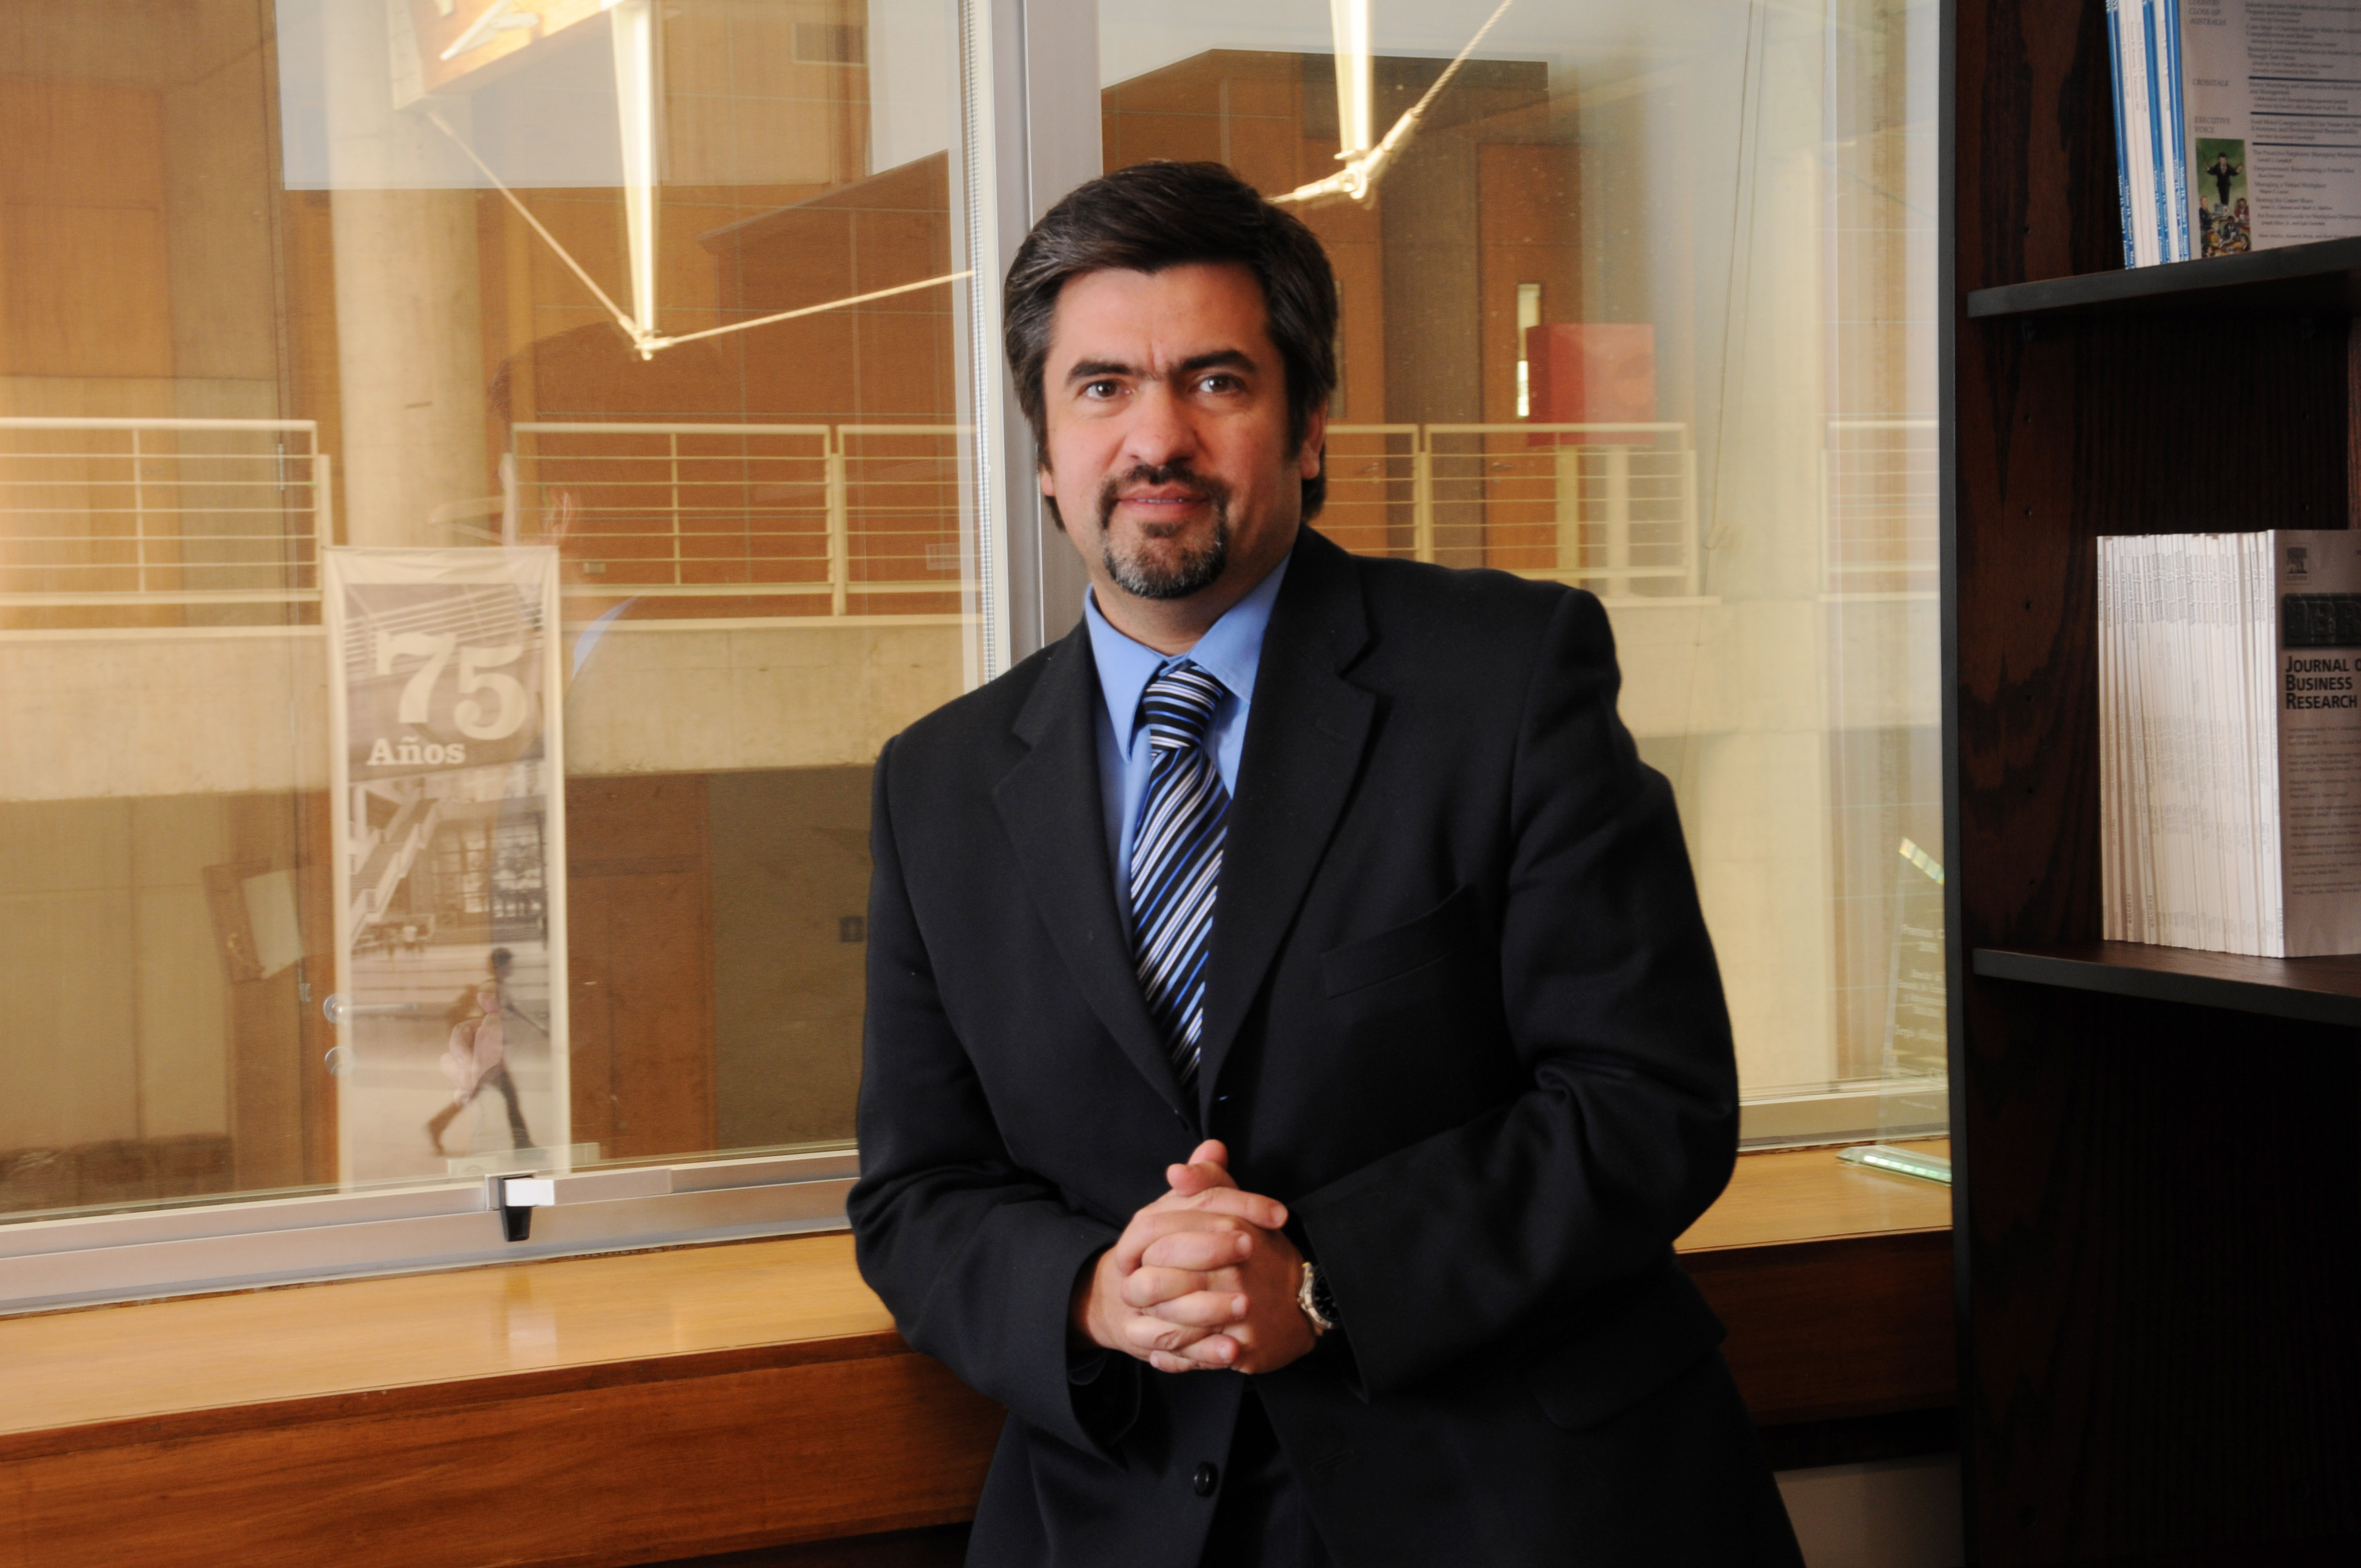 SergioOlavarrieta_Universidad de Chile_ QLU_ MBA_Maestrias Panama